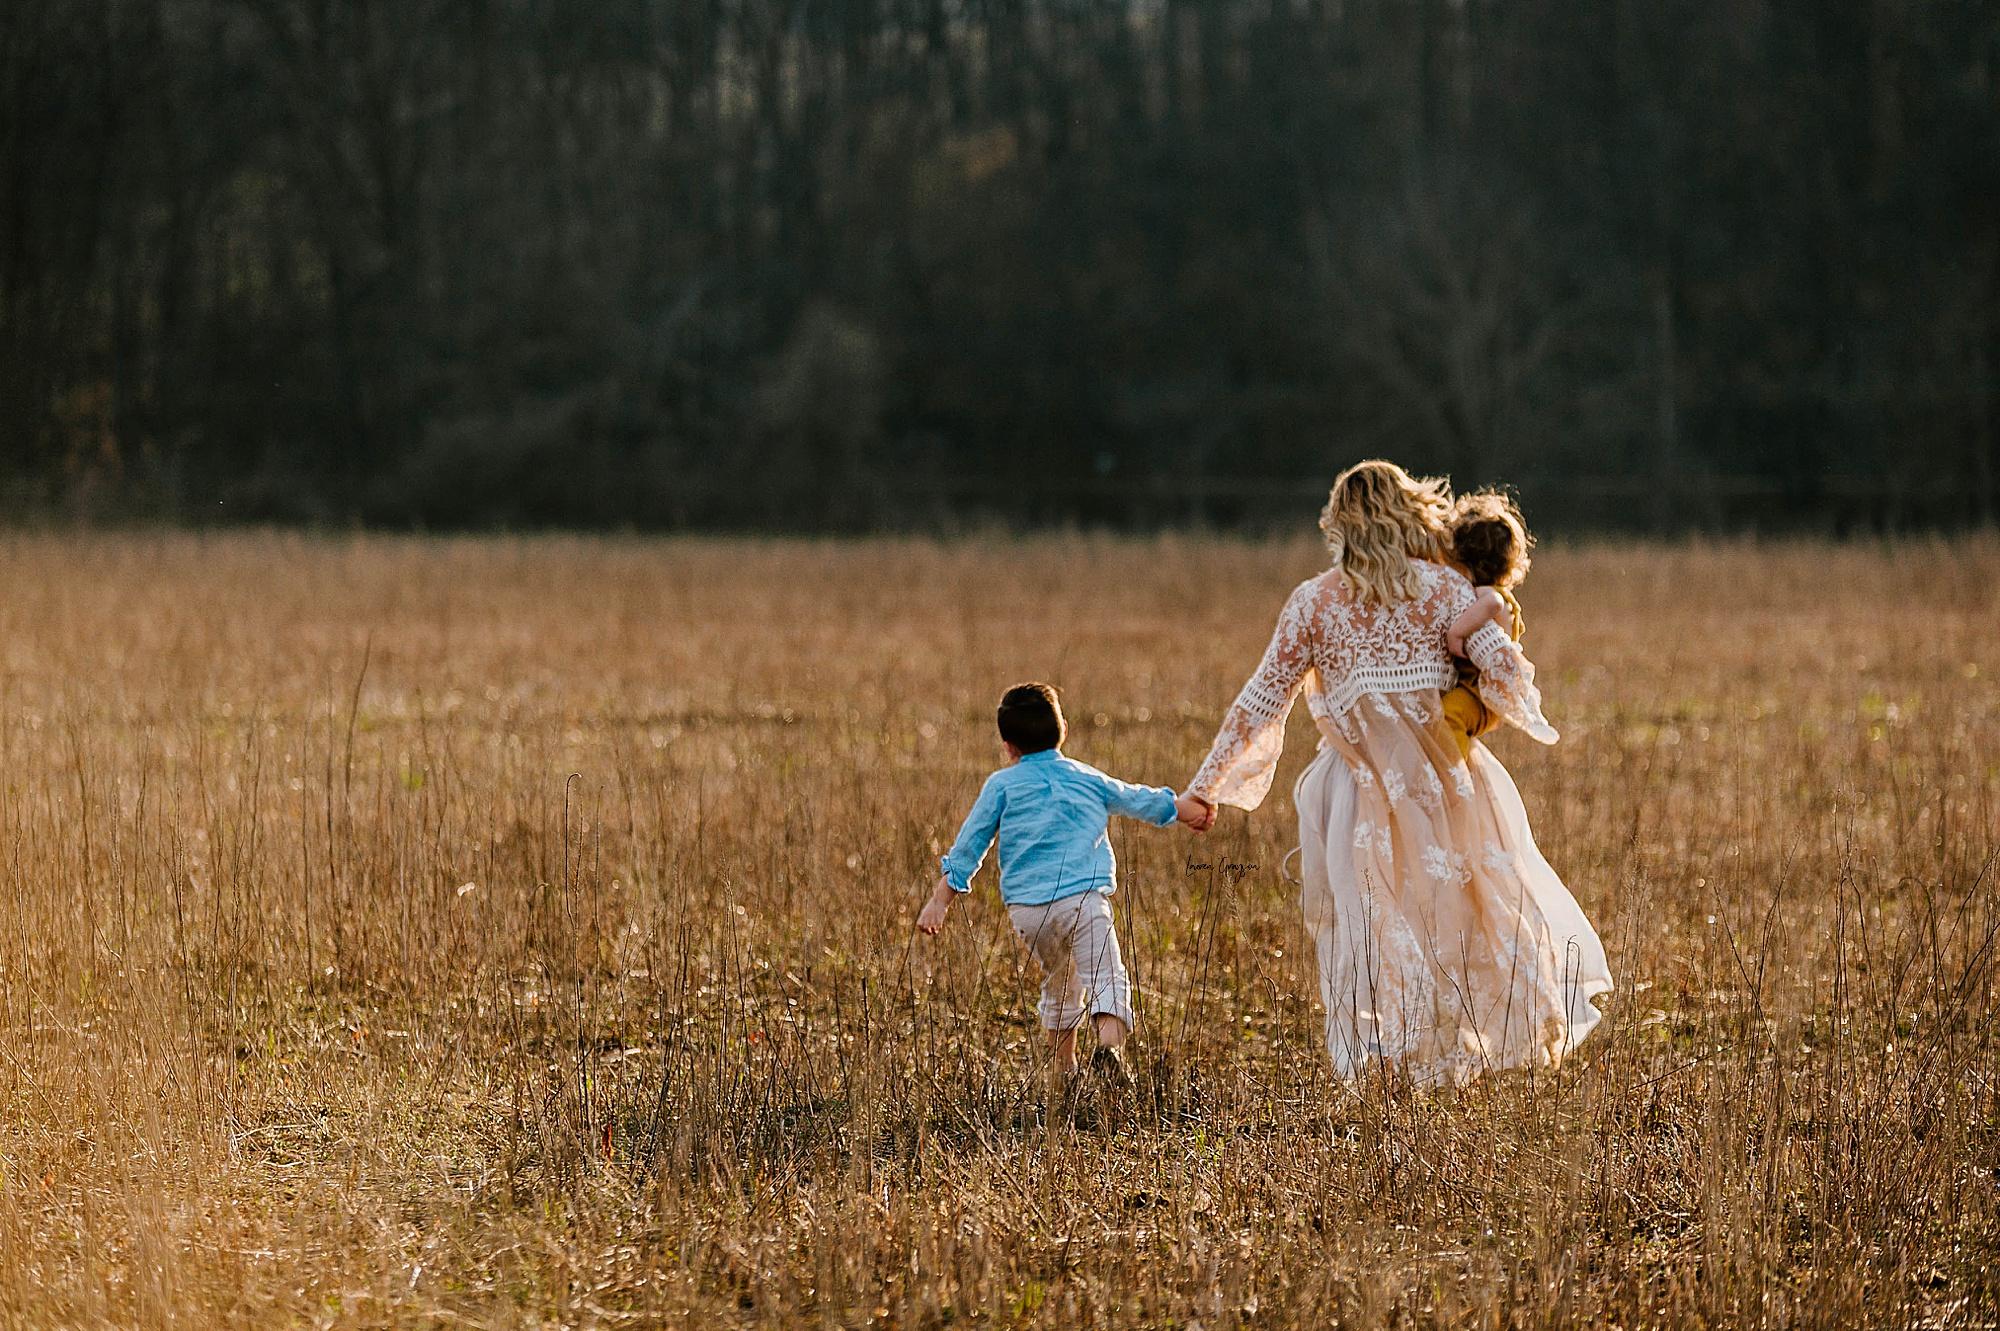 lauren-grayson-photography-akron-ohio-family-mom-boys-field-spring-outdoor-session_0022.jpg